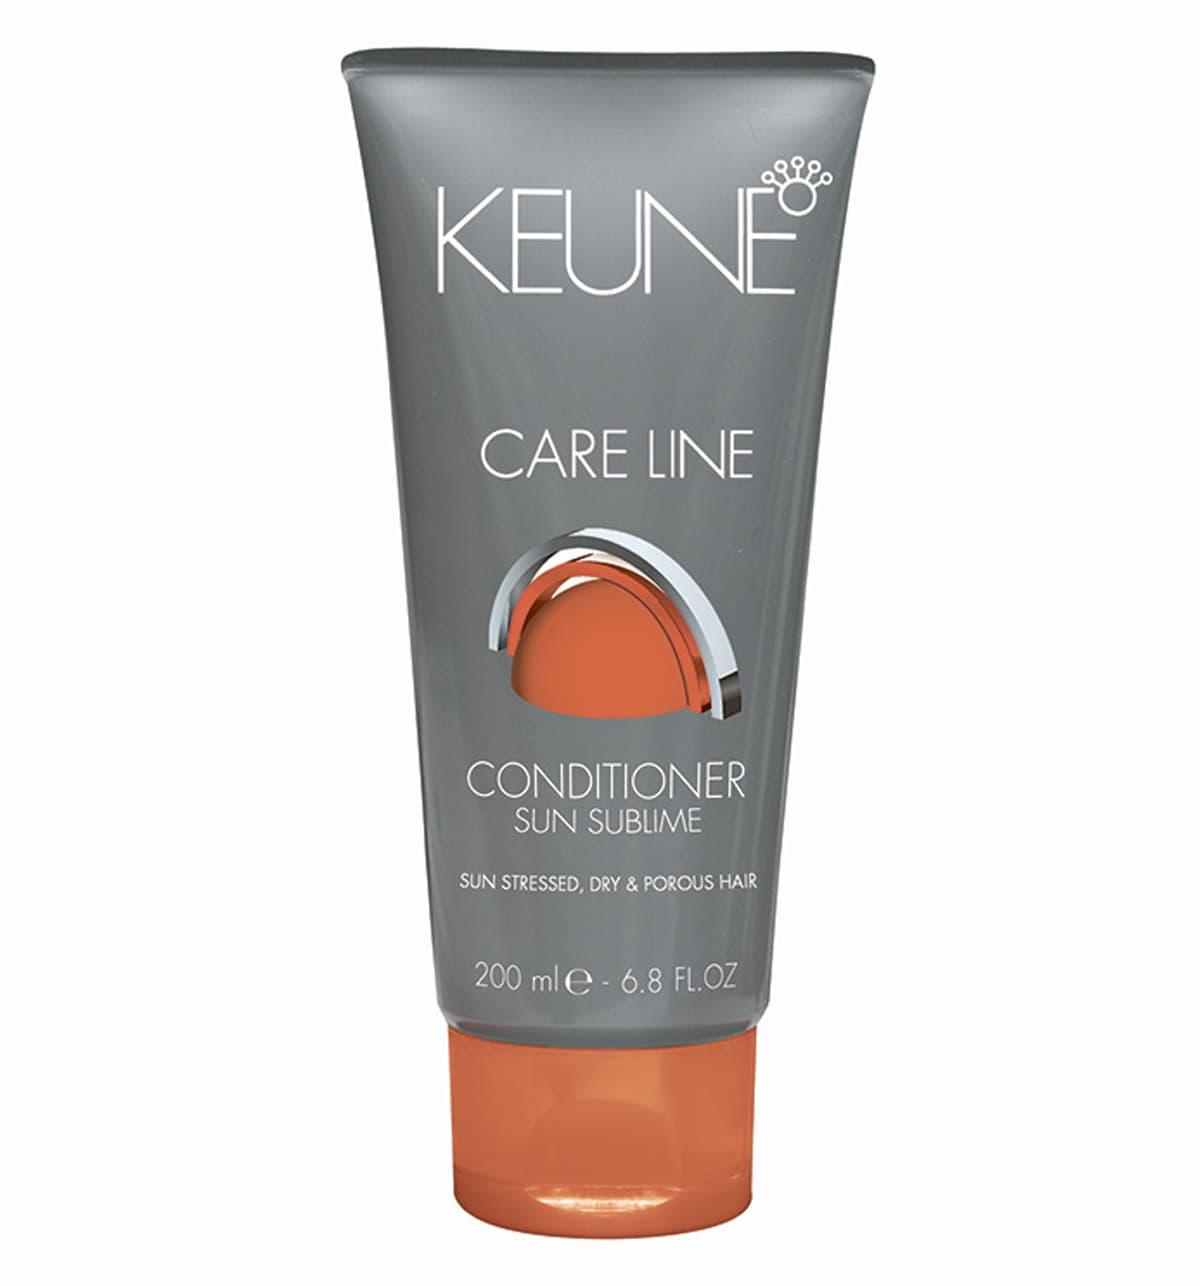 Keune Care Line Sun Sublime Conditioner Кондиционер Экстра Защита